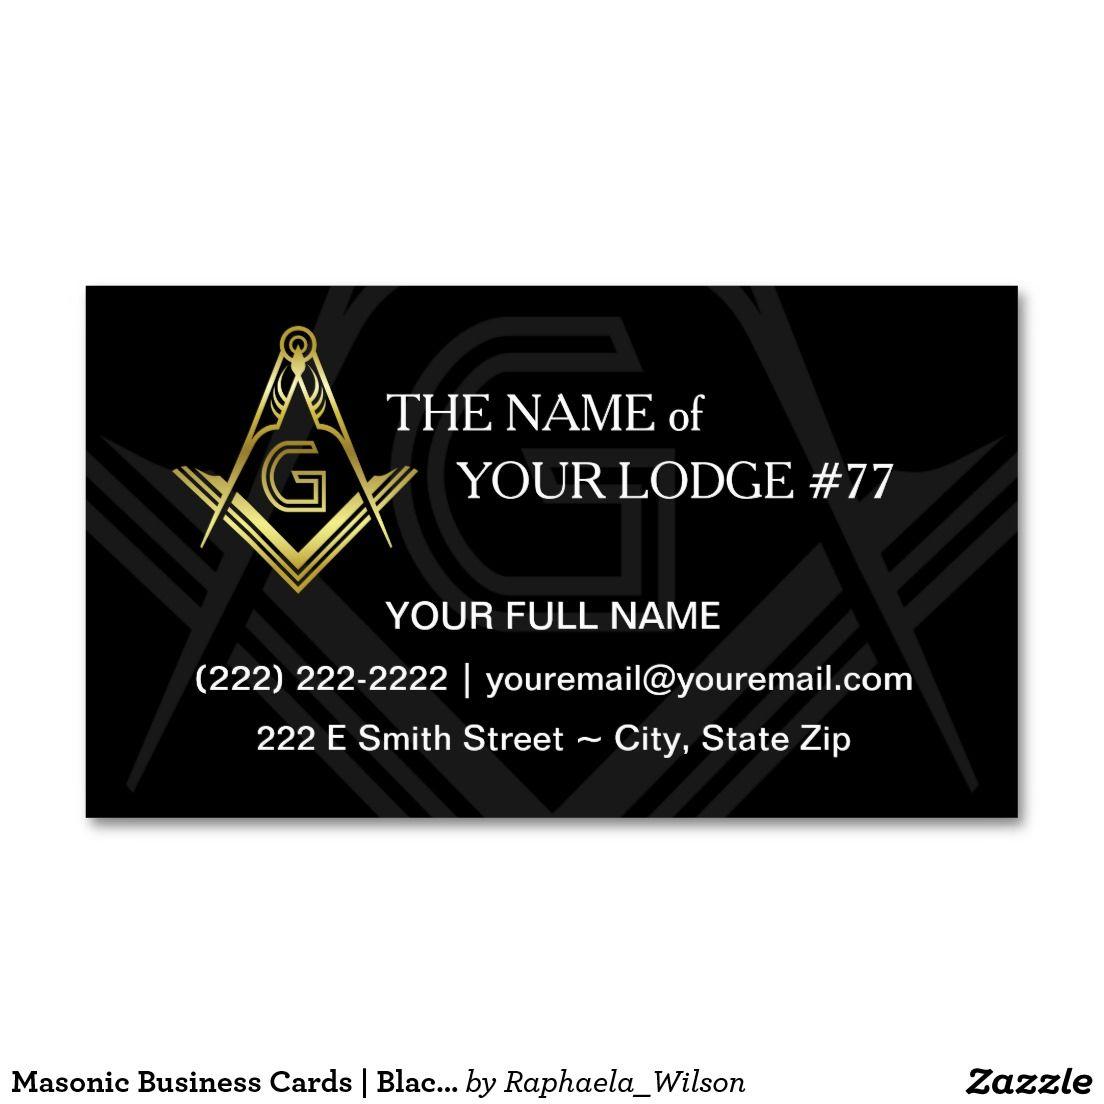 Masonic Business Cards | Black and Gold Freemason | Custom Masonic ...